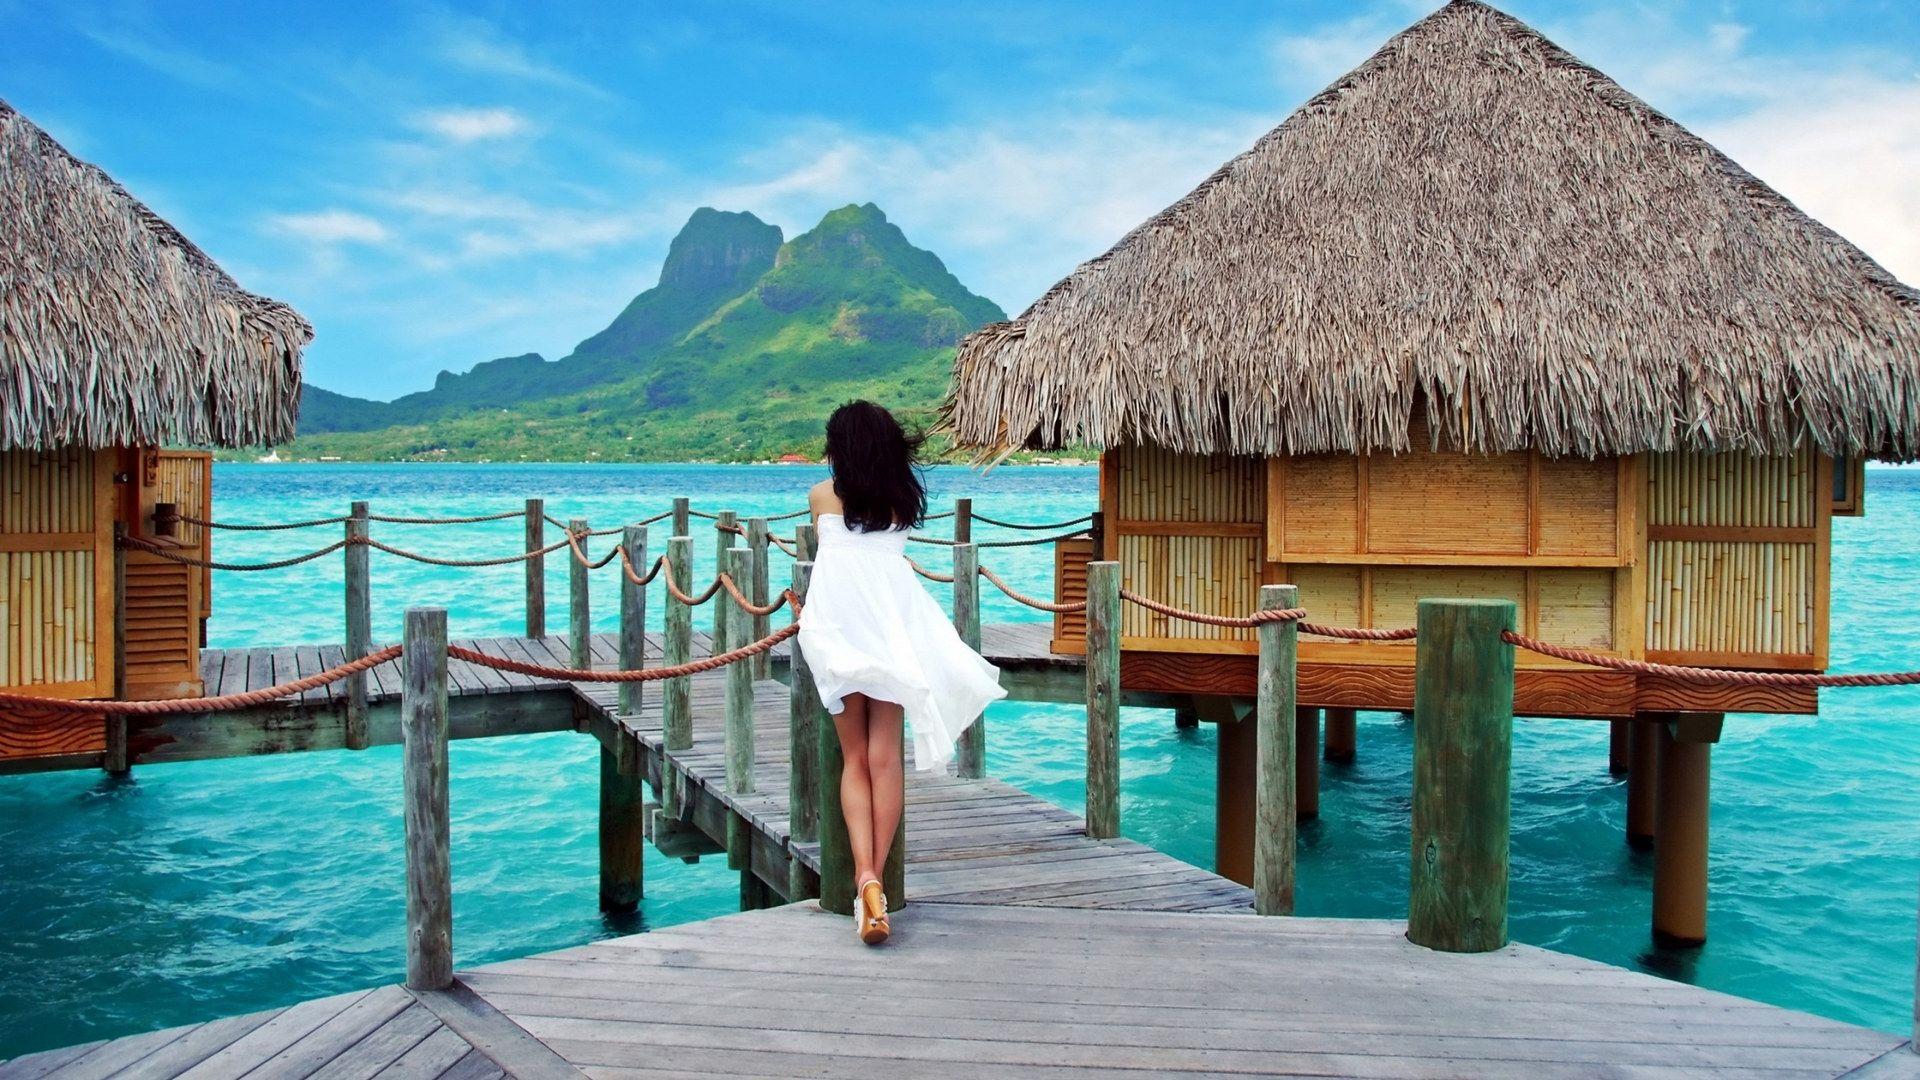 Bora Bora background